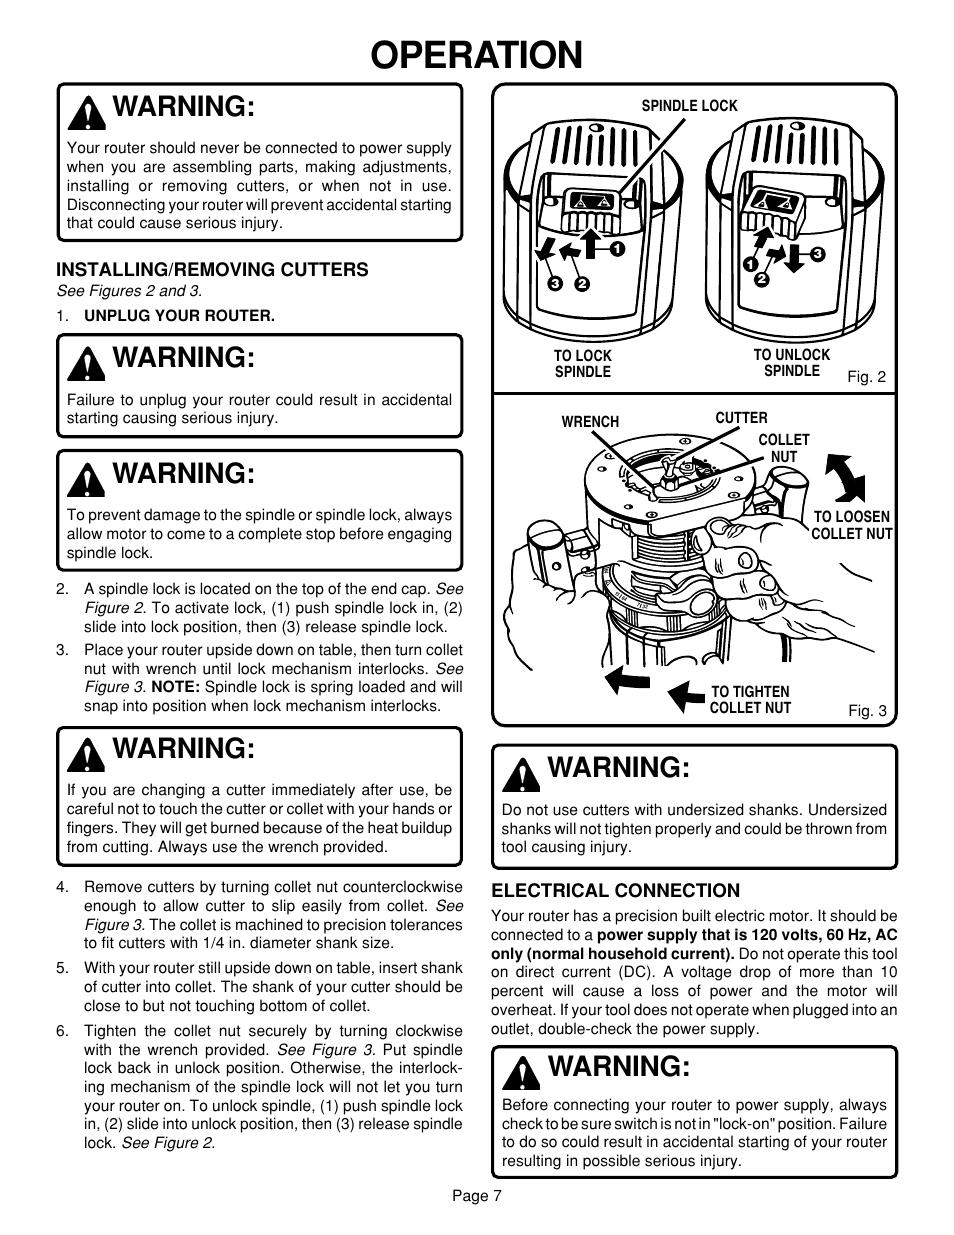 operation warning ryobi r160 user manual page 7 17 rh manualsdir com